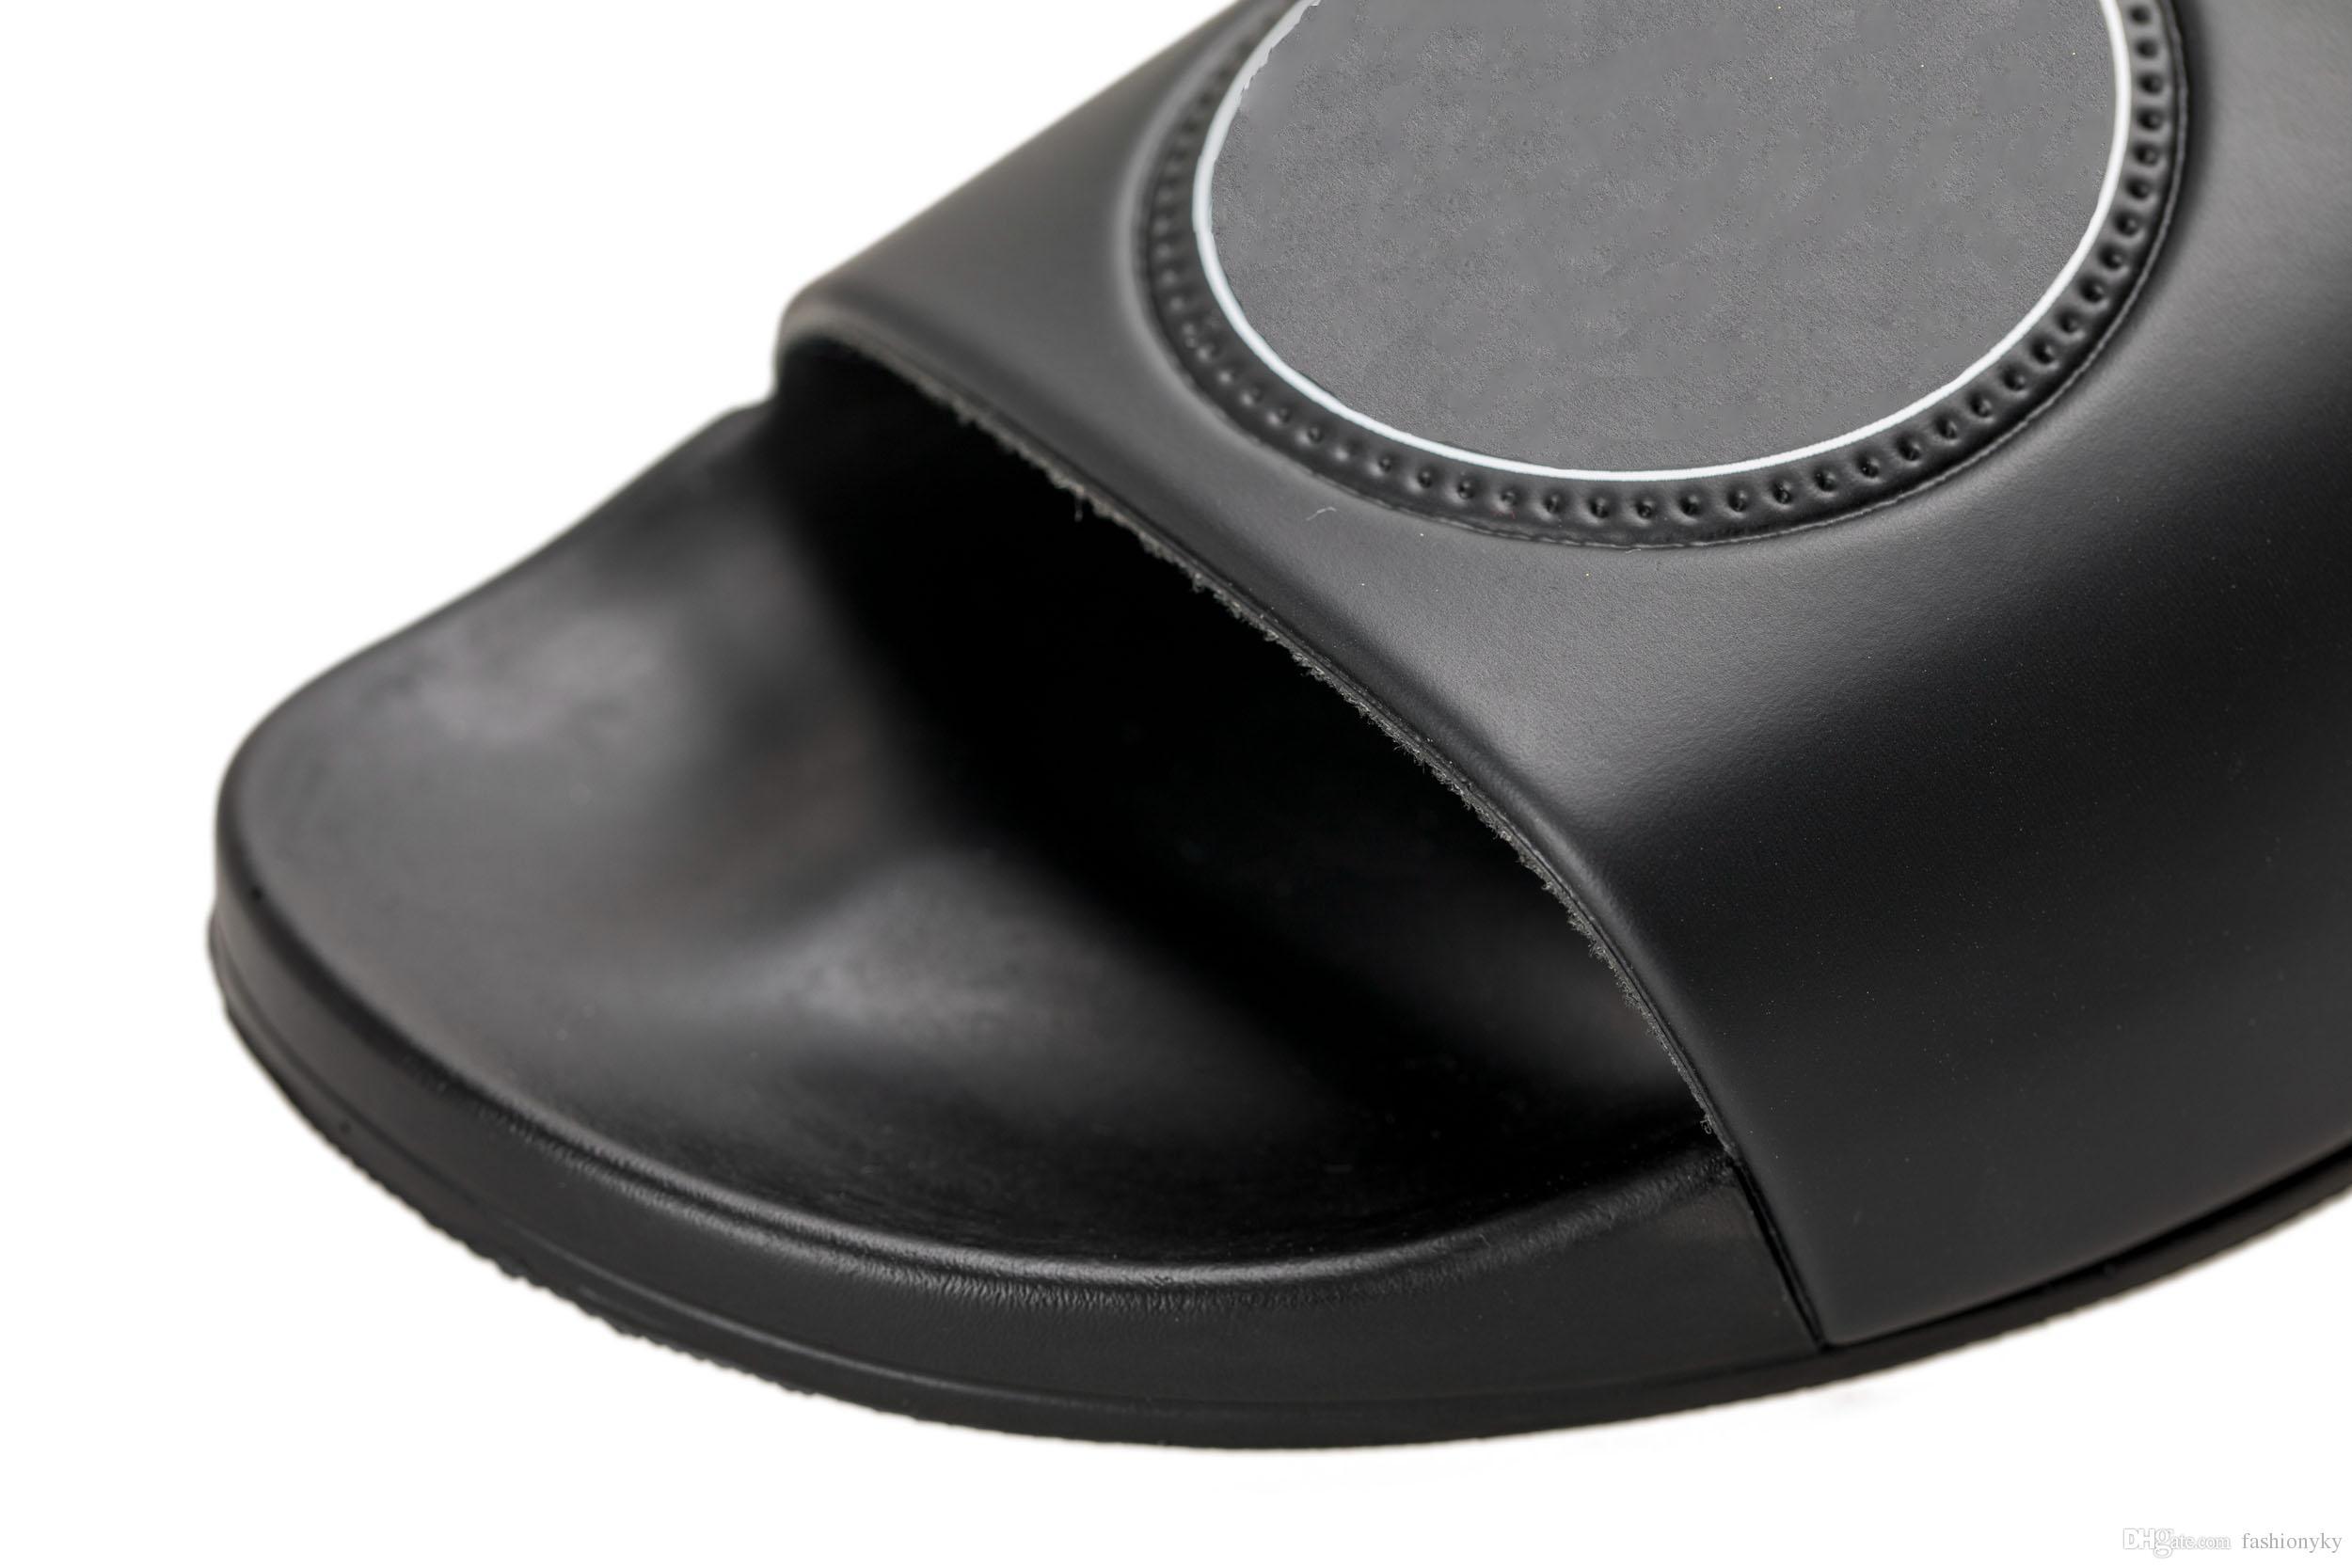 c7c278f3a1b New product hot brand Men Beach Slide Sandals Medusa Scuffs 2018 Slippers  Mens Beach Fashion slip-on designer sandals